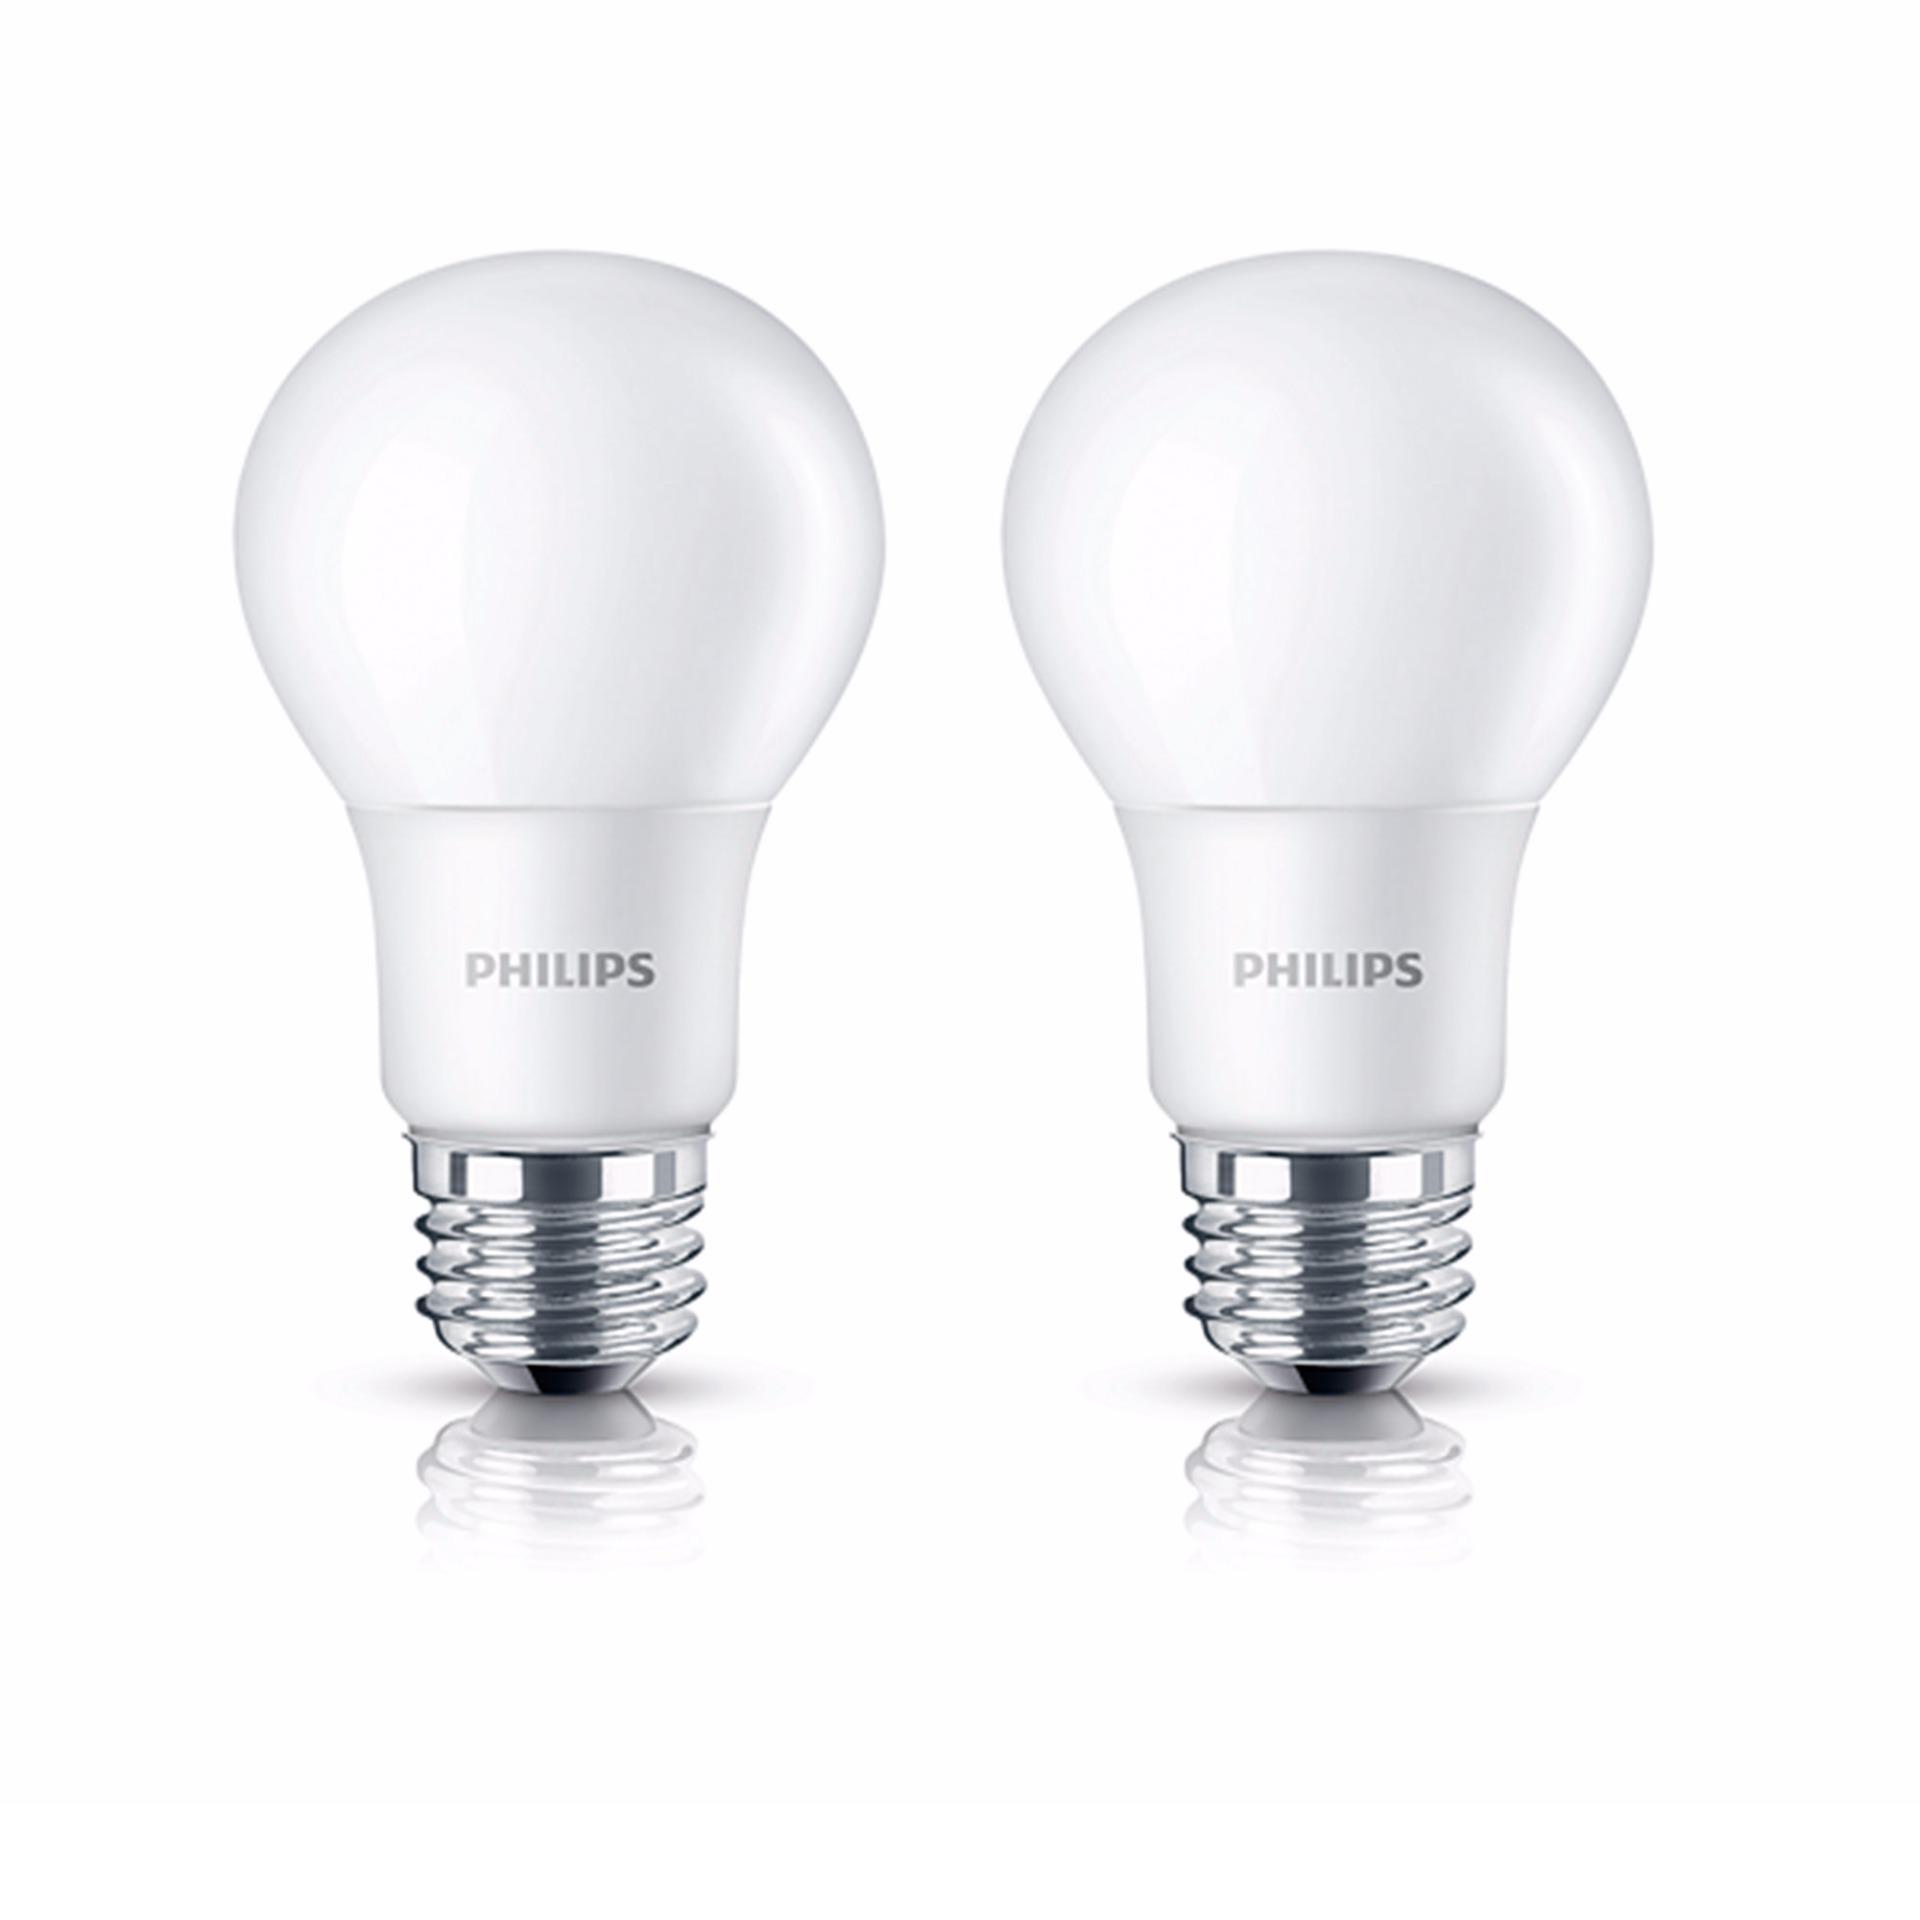 Tidur Source · Philips Lampu LED Bulb 13 Watt E27 3000K 230V Kuning .